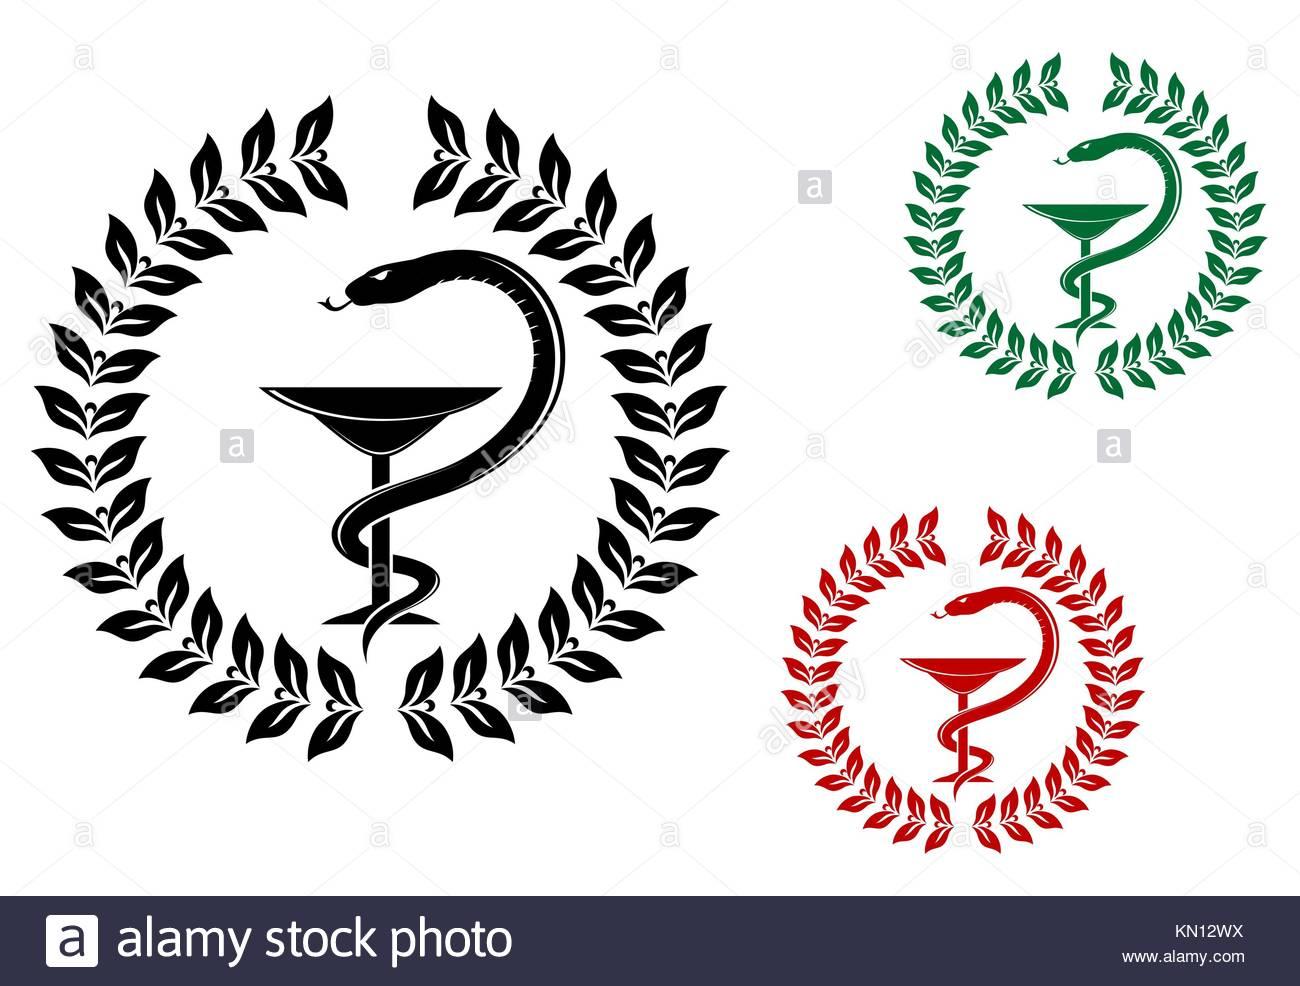 Caduceus medical symbol icon vector stock photos caduceus medicine symbol snake on cup in laurel wreath stock image buycottarizona